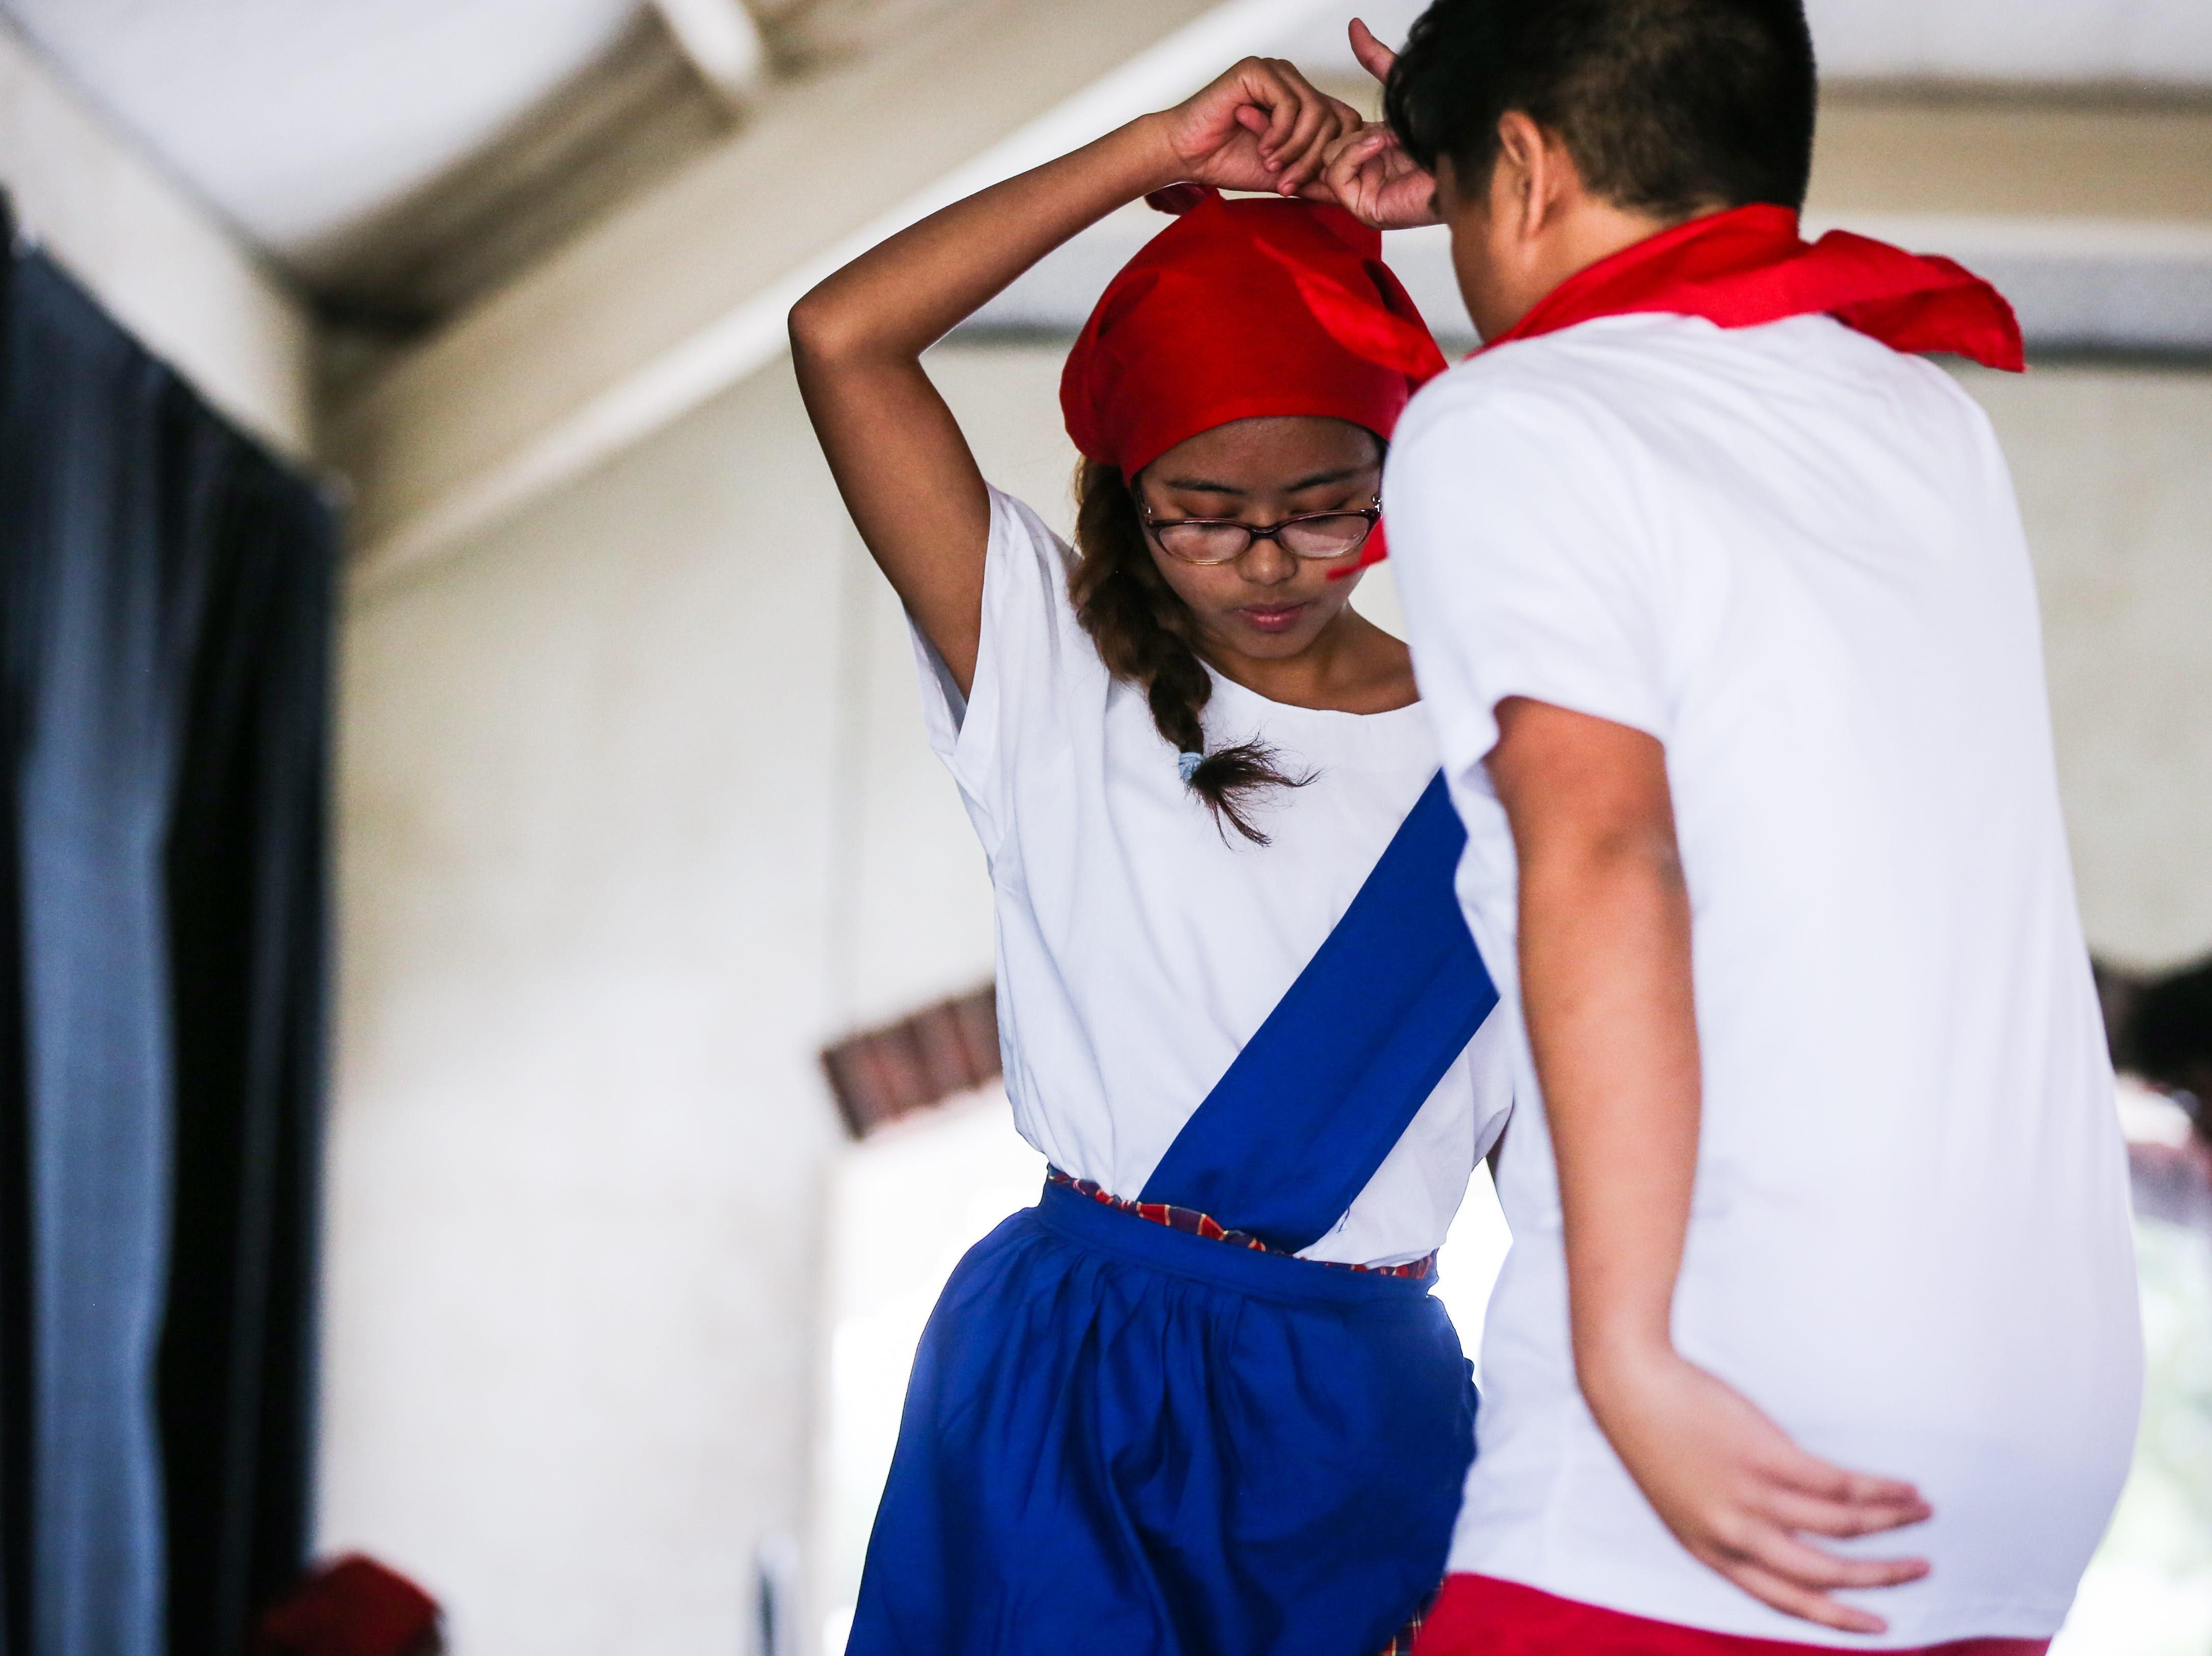 Teens dance the Tinikling, a traditional Philippine folk dance, during the Asian Bazaar Saturday, Oct. 20, 2018, at El Paseo de Santa Angela.